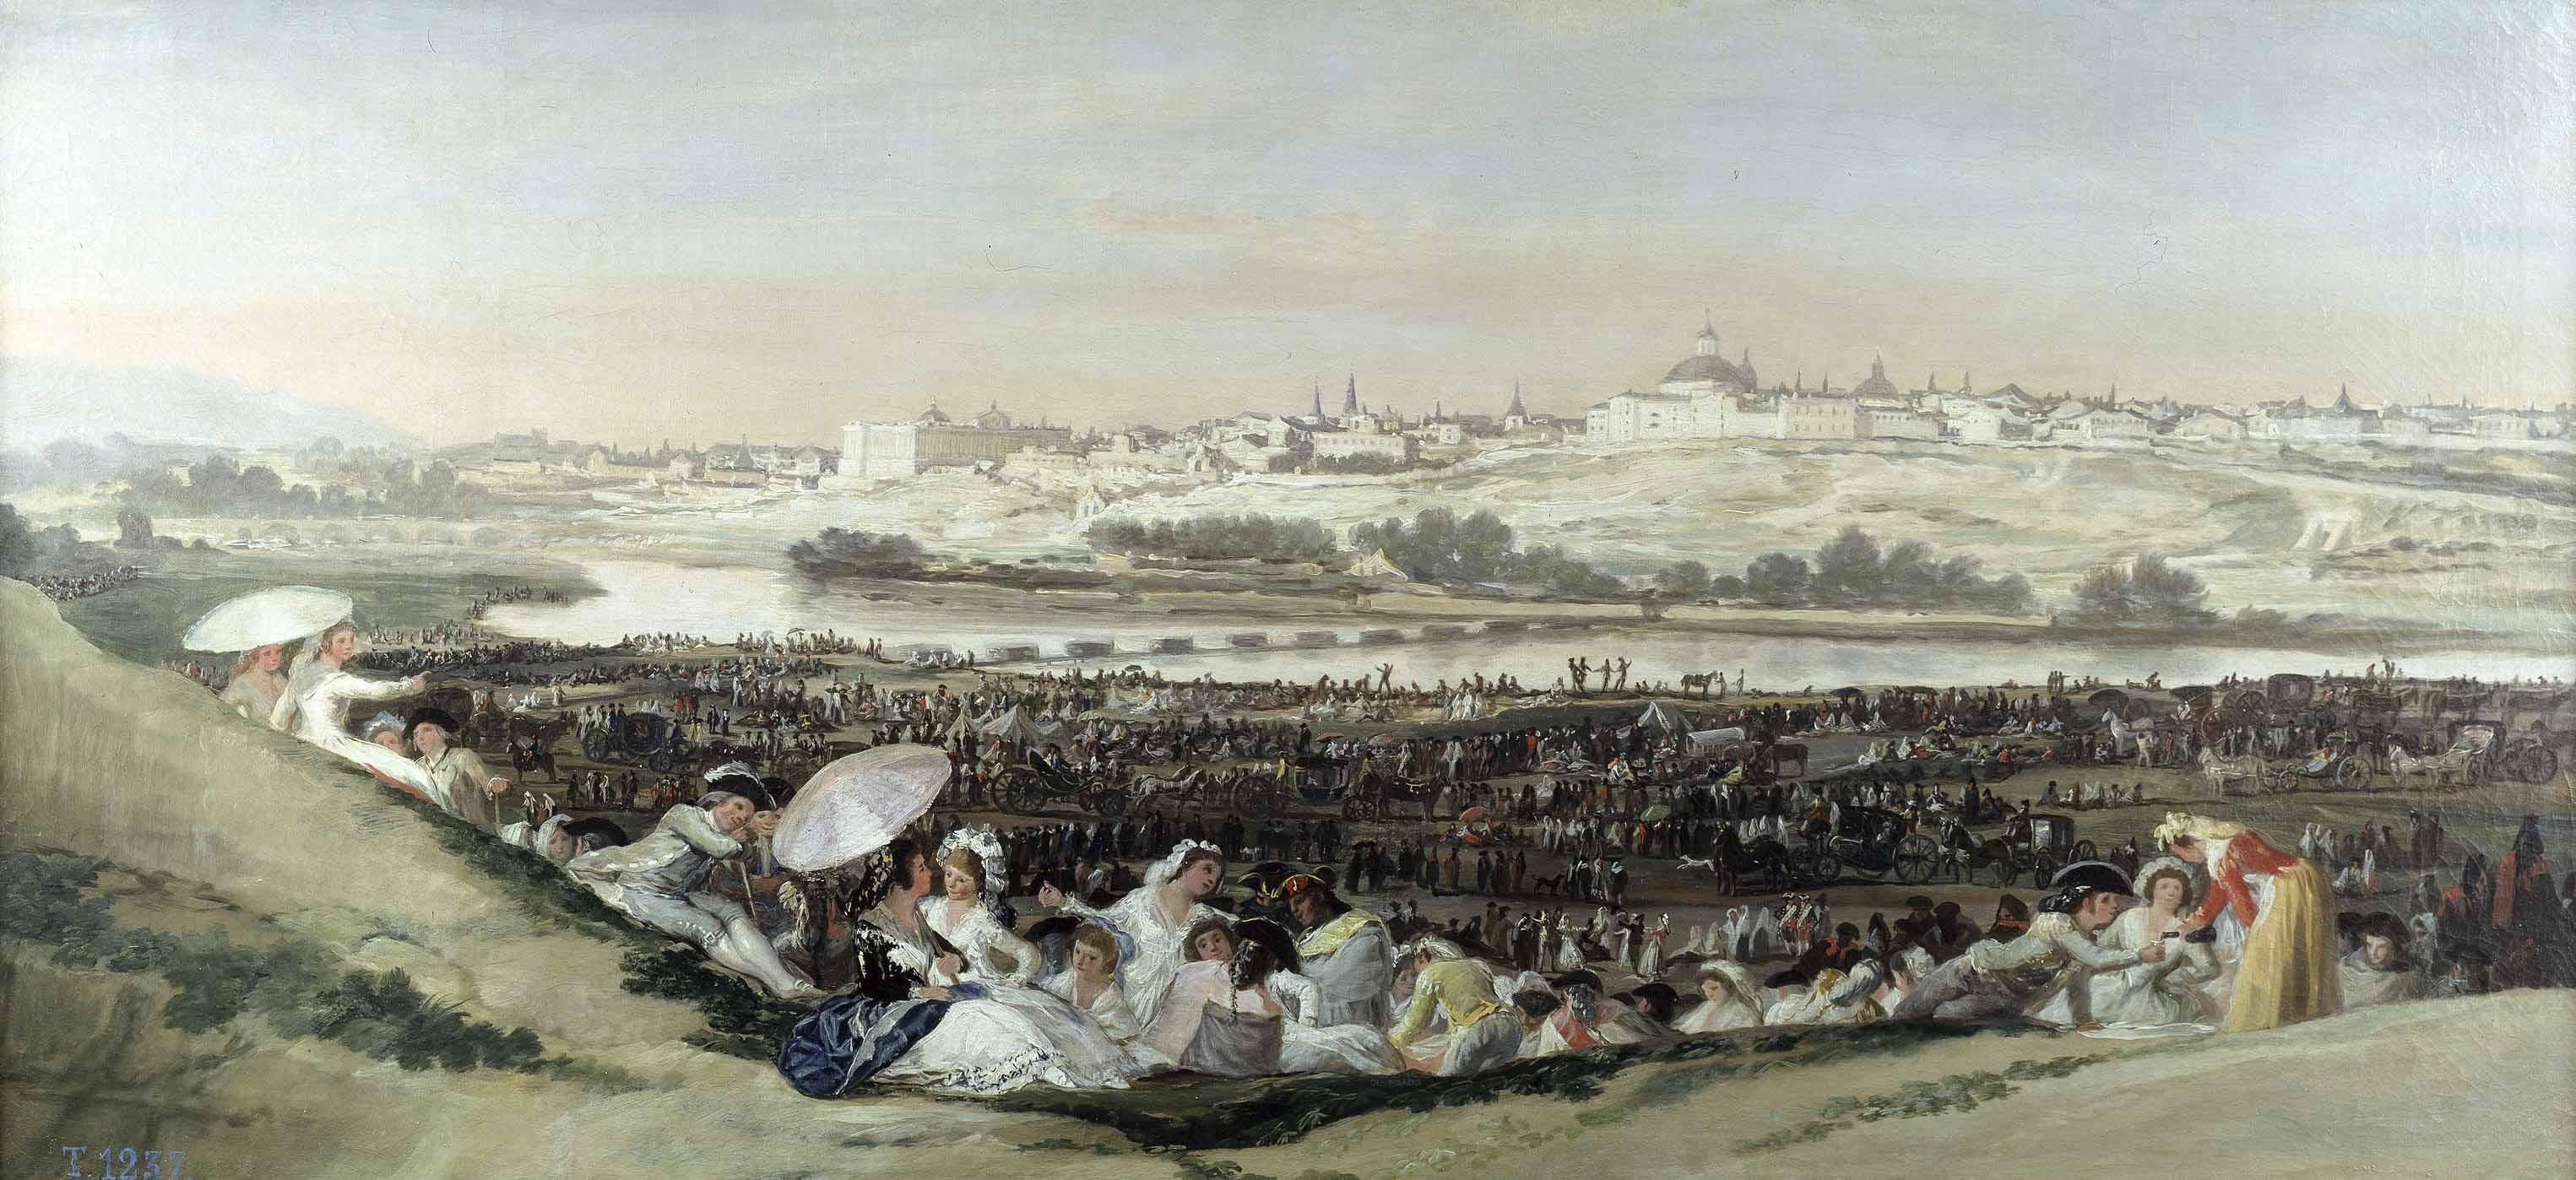 Pradera de San Isidro - Goya